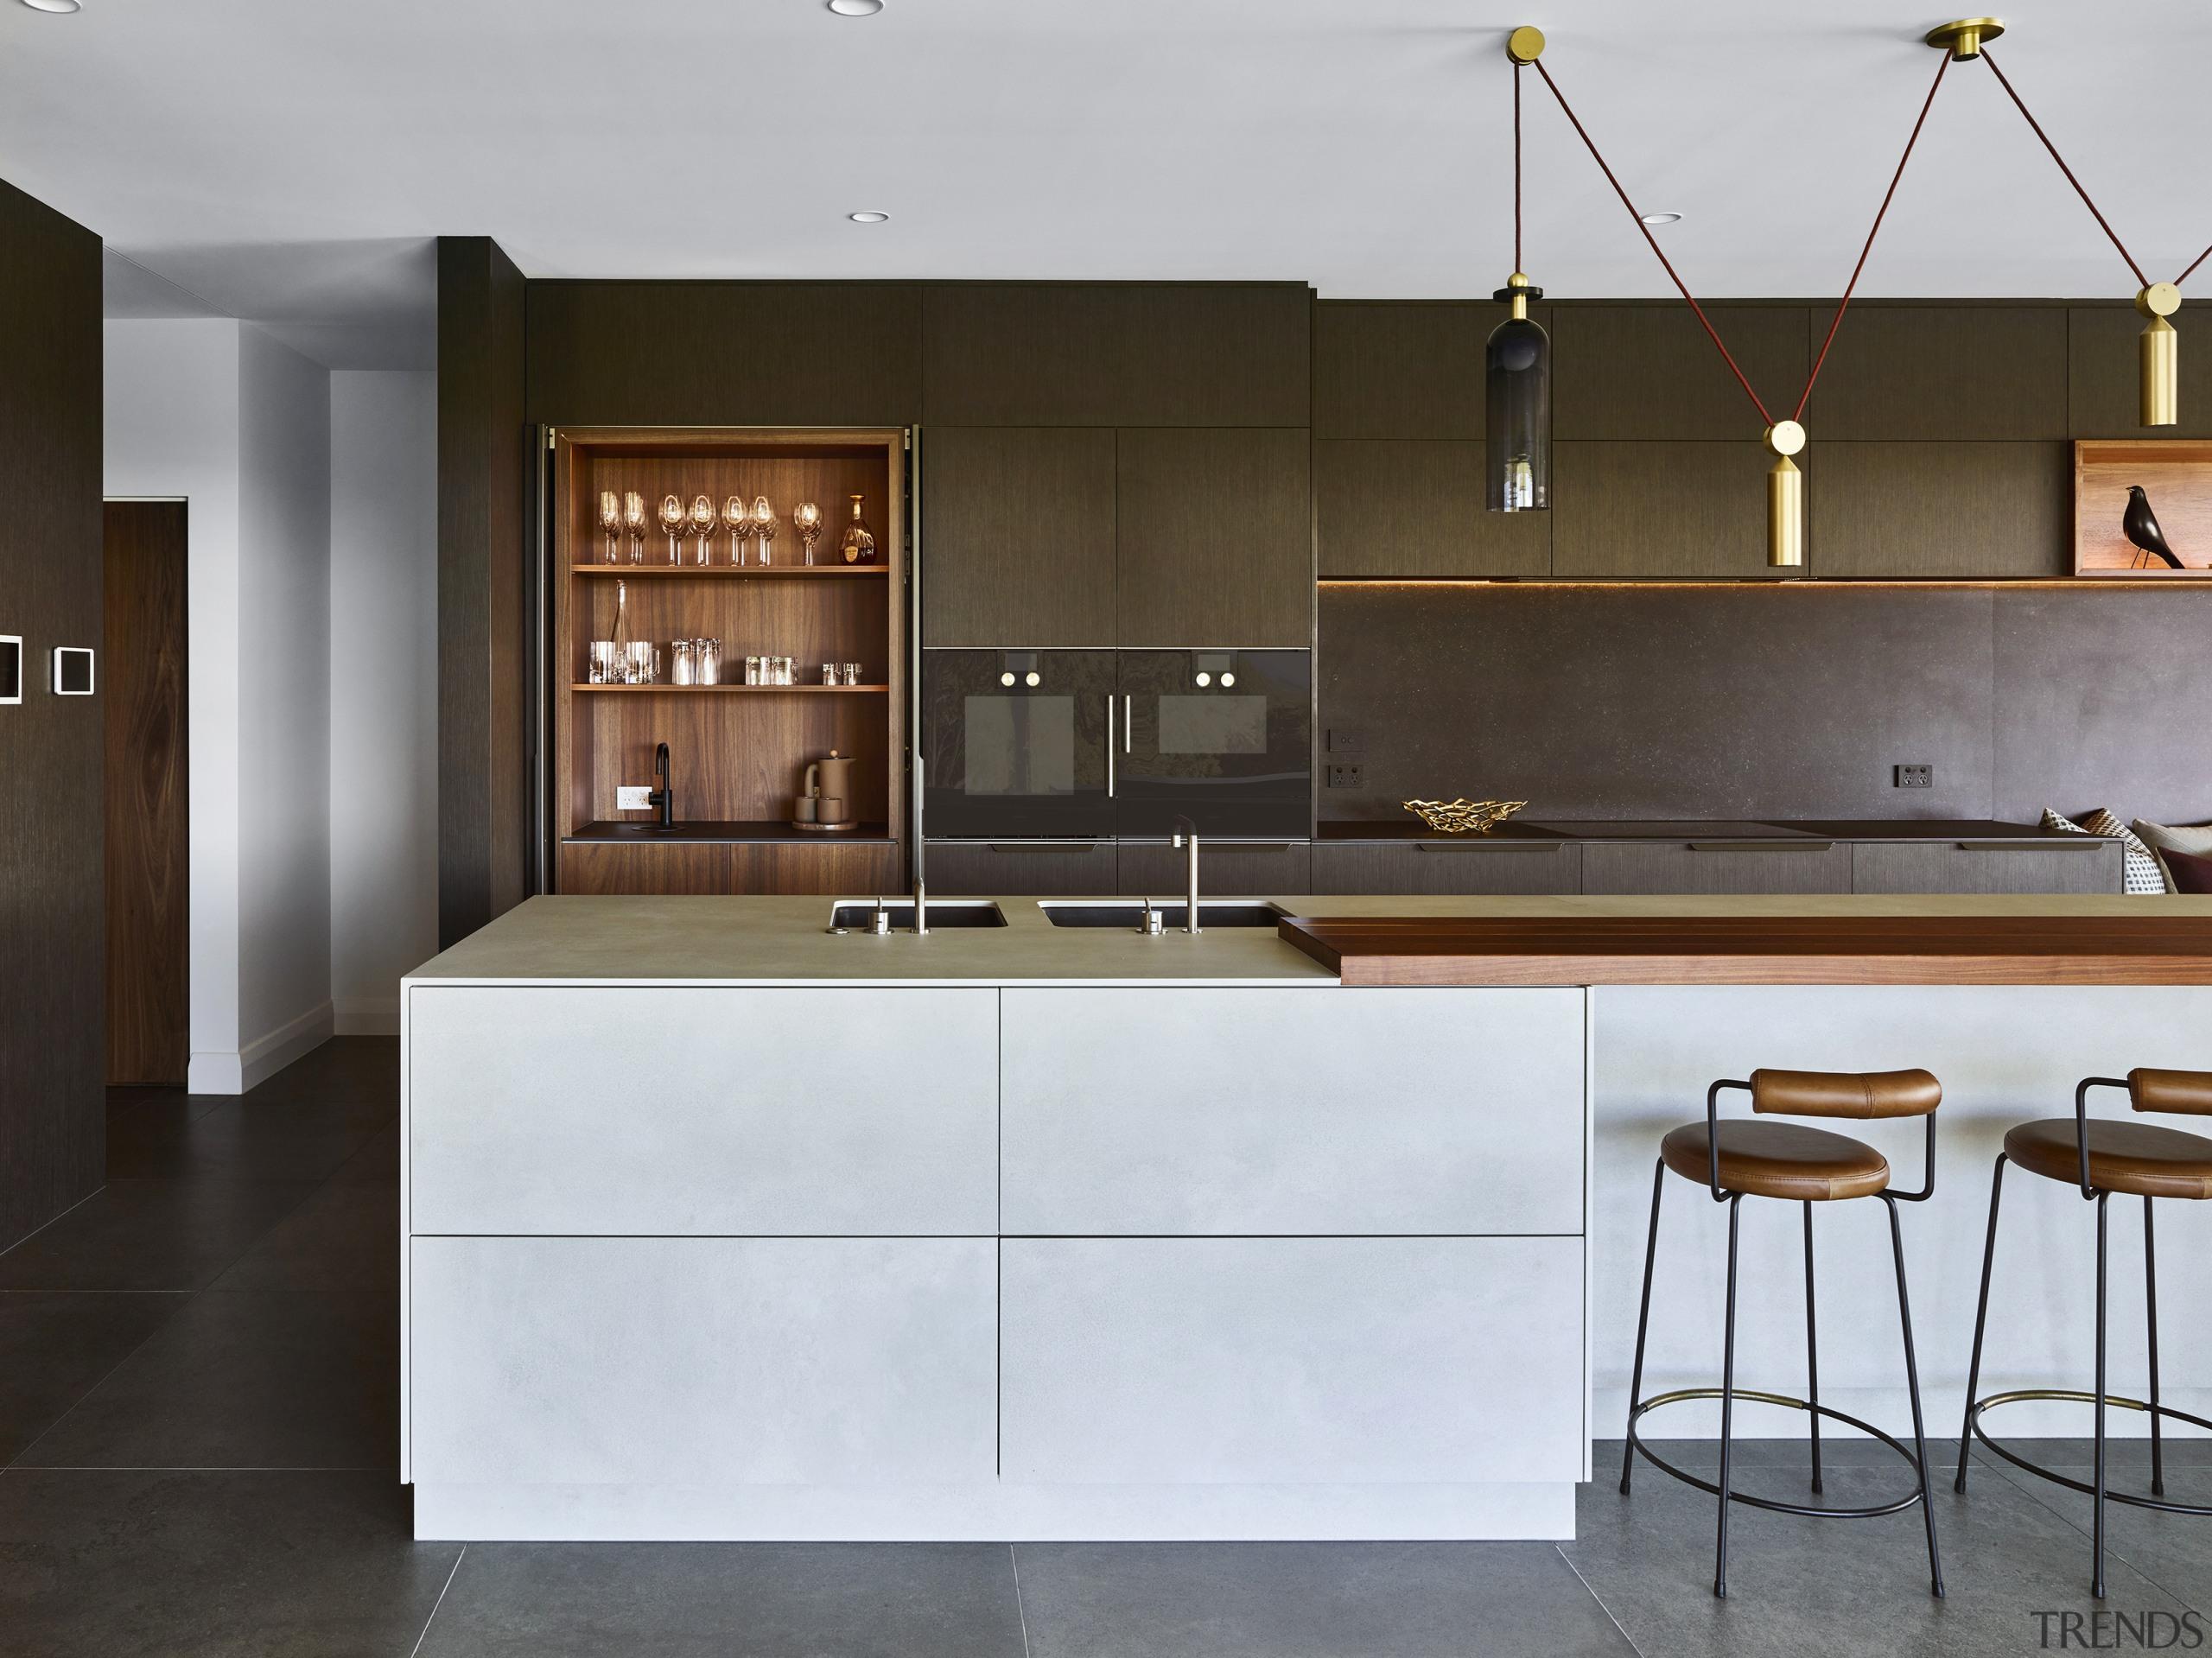 This kitchen by designer Darren James features dark architecture, bar stool, cabinetry, countertop, Darren James, wood veneer, porcelain sheeting, drinks station